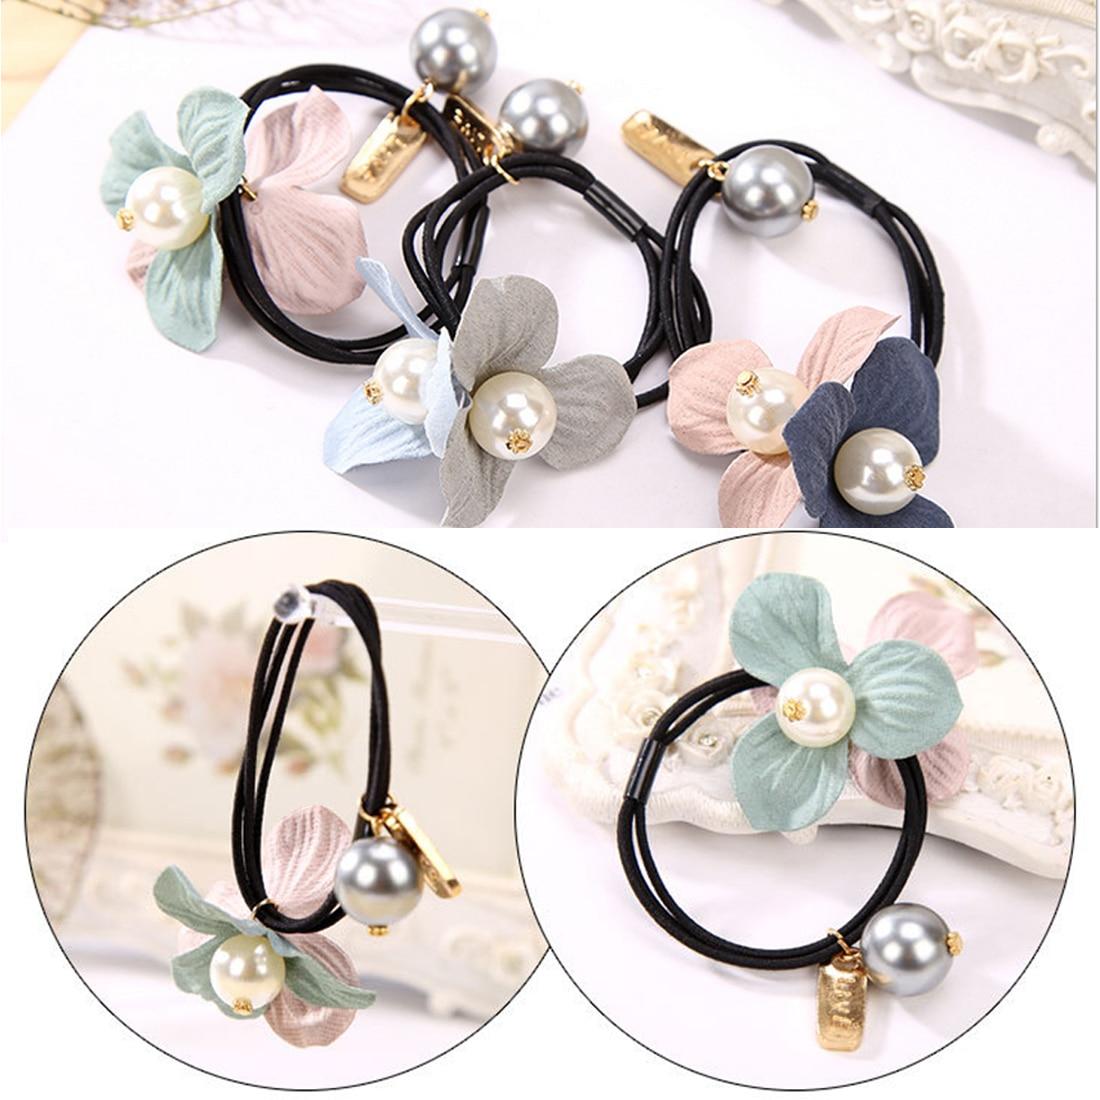 Hair Rope Headbands Elegant Three Leaf Simulated Pearl Flowers Elastic Hair Ring Bands Hair Accessories for Women Girls